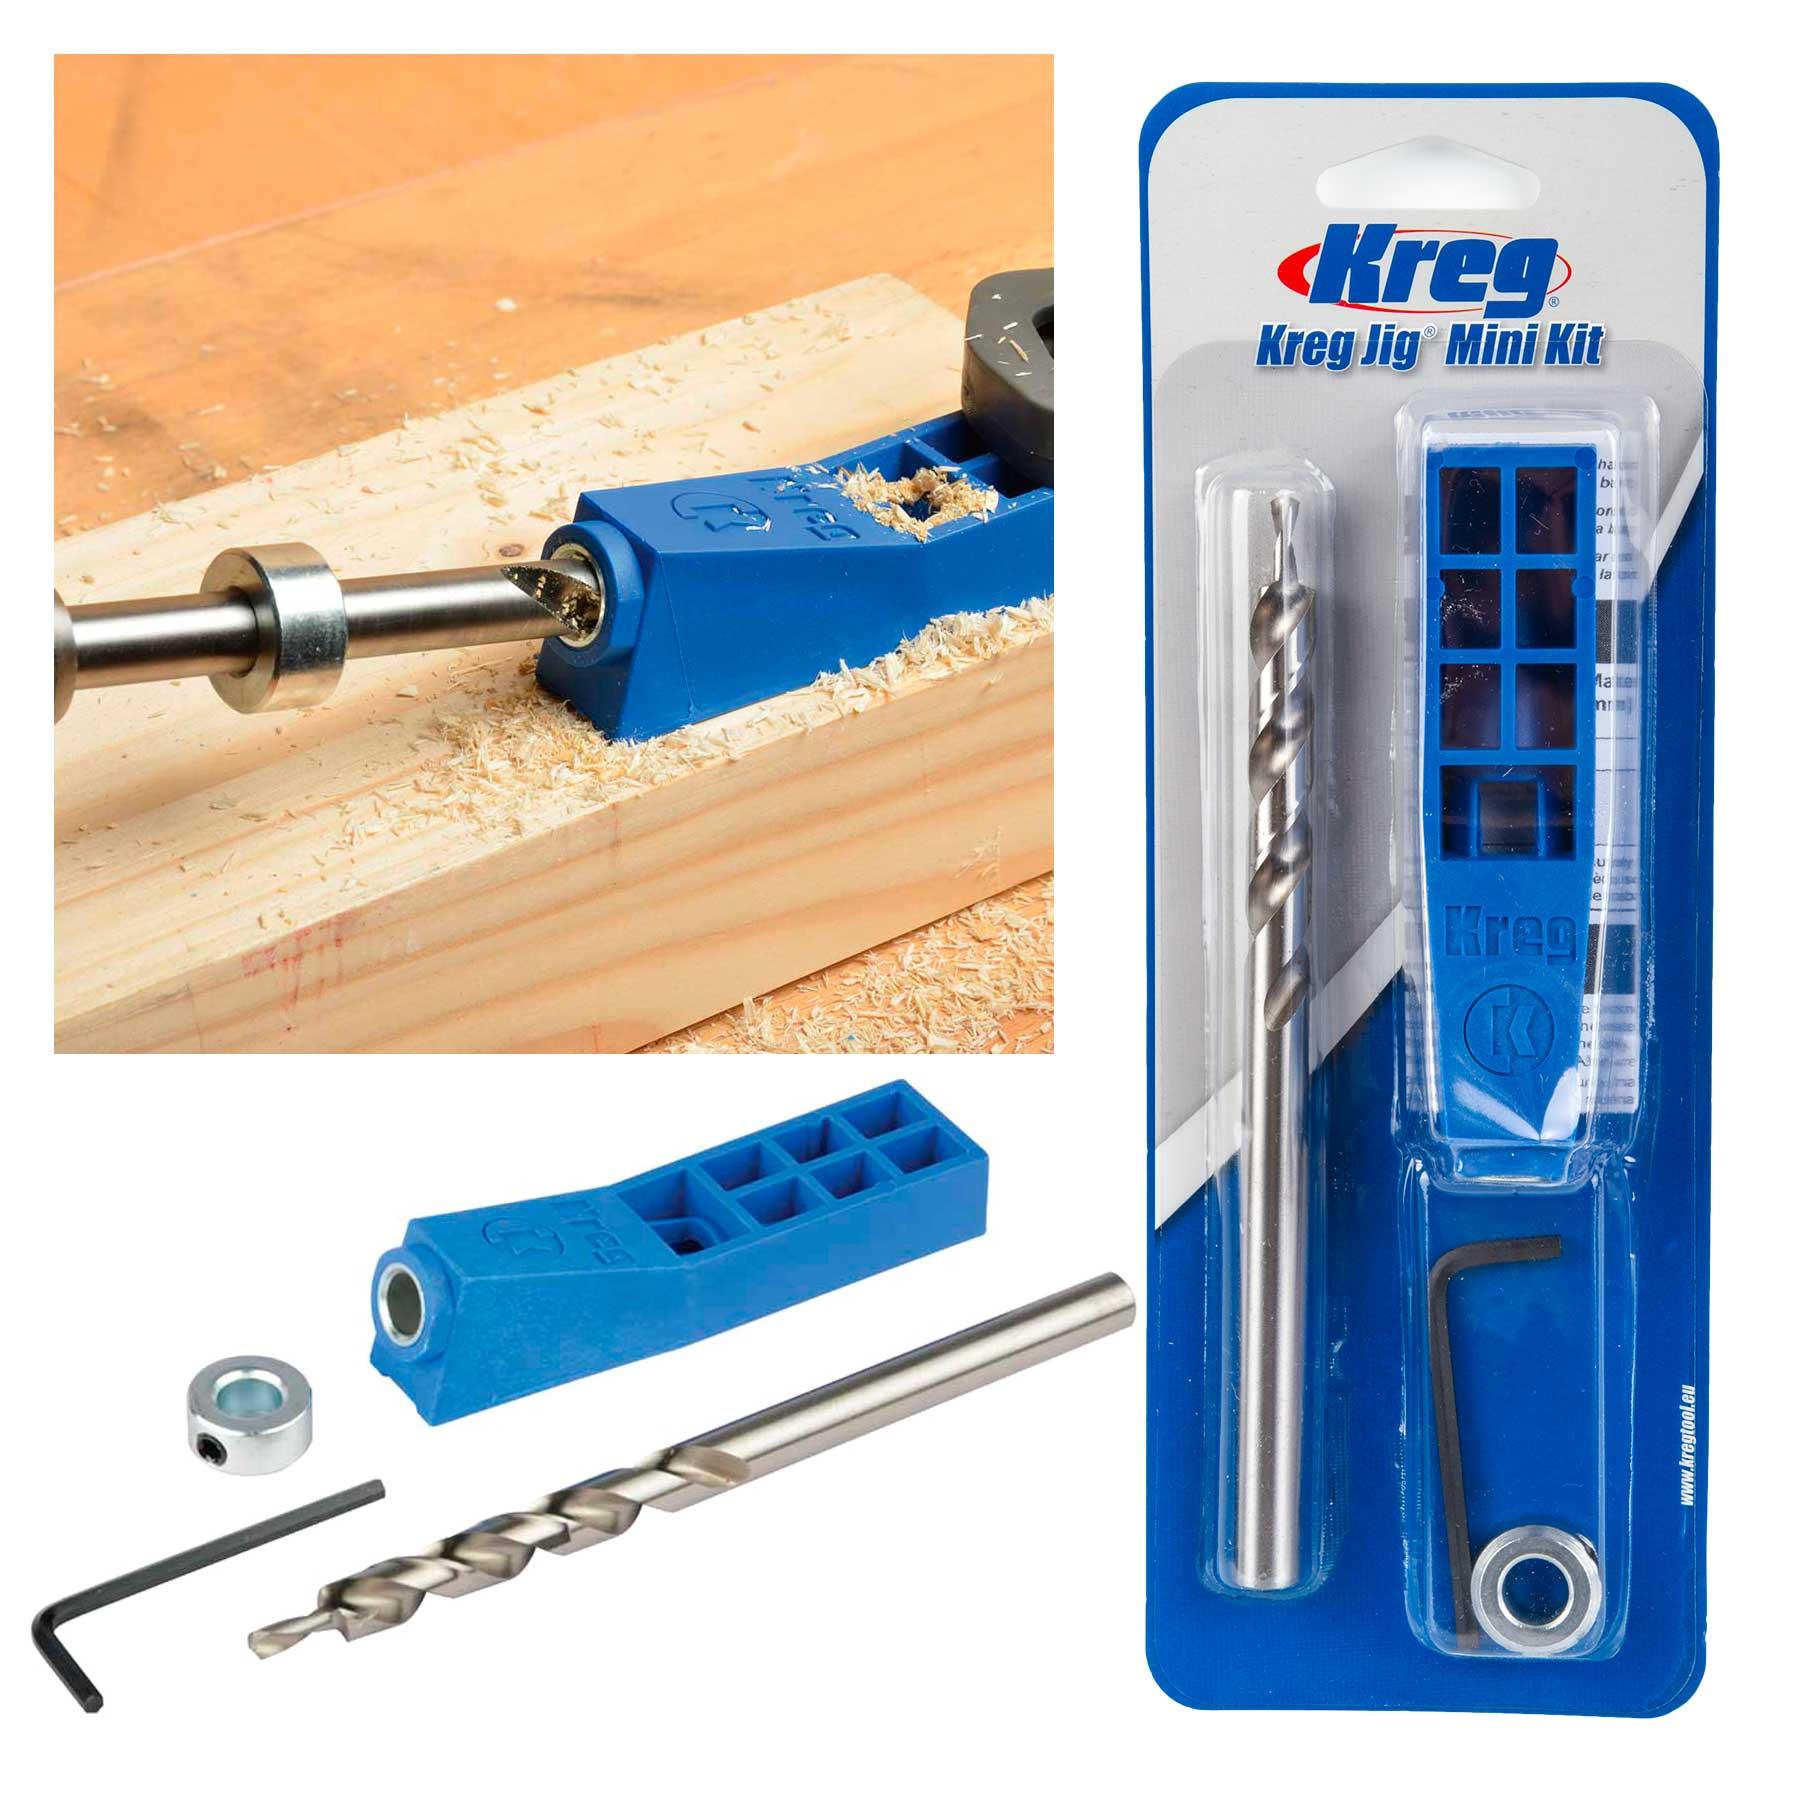 Kreg pocket hole jig mini kit machine system with step drill bit shop categories solutioingenieria Choice Image